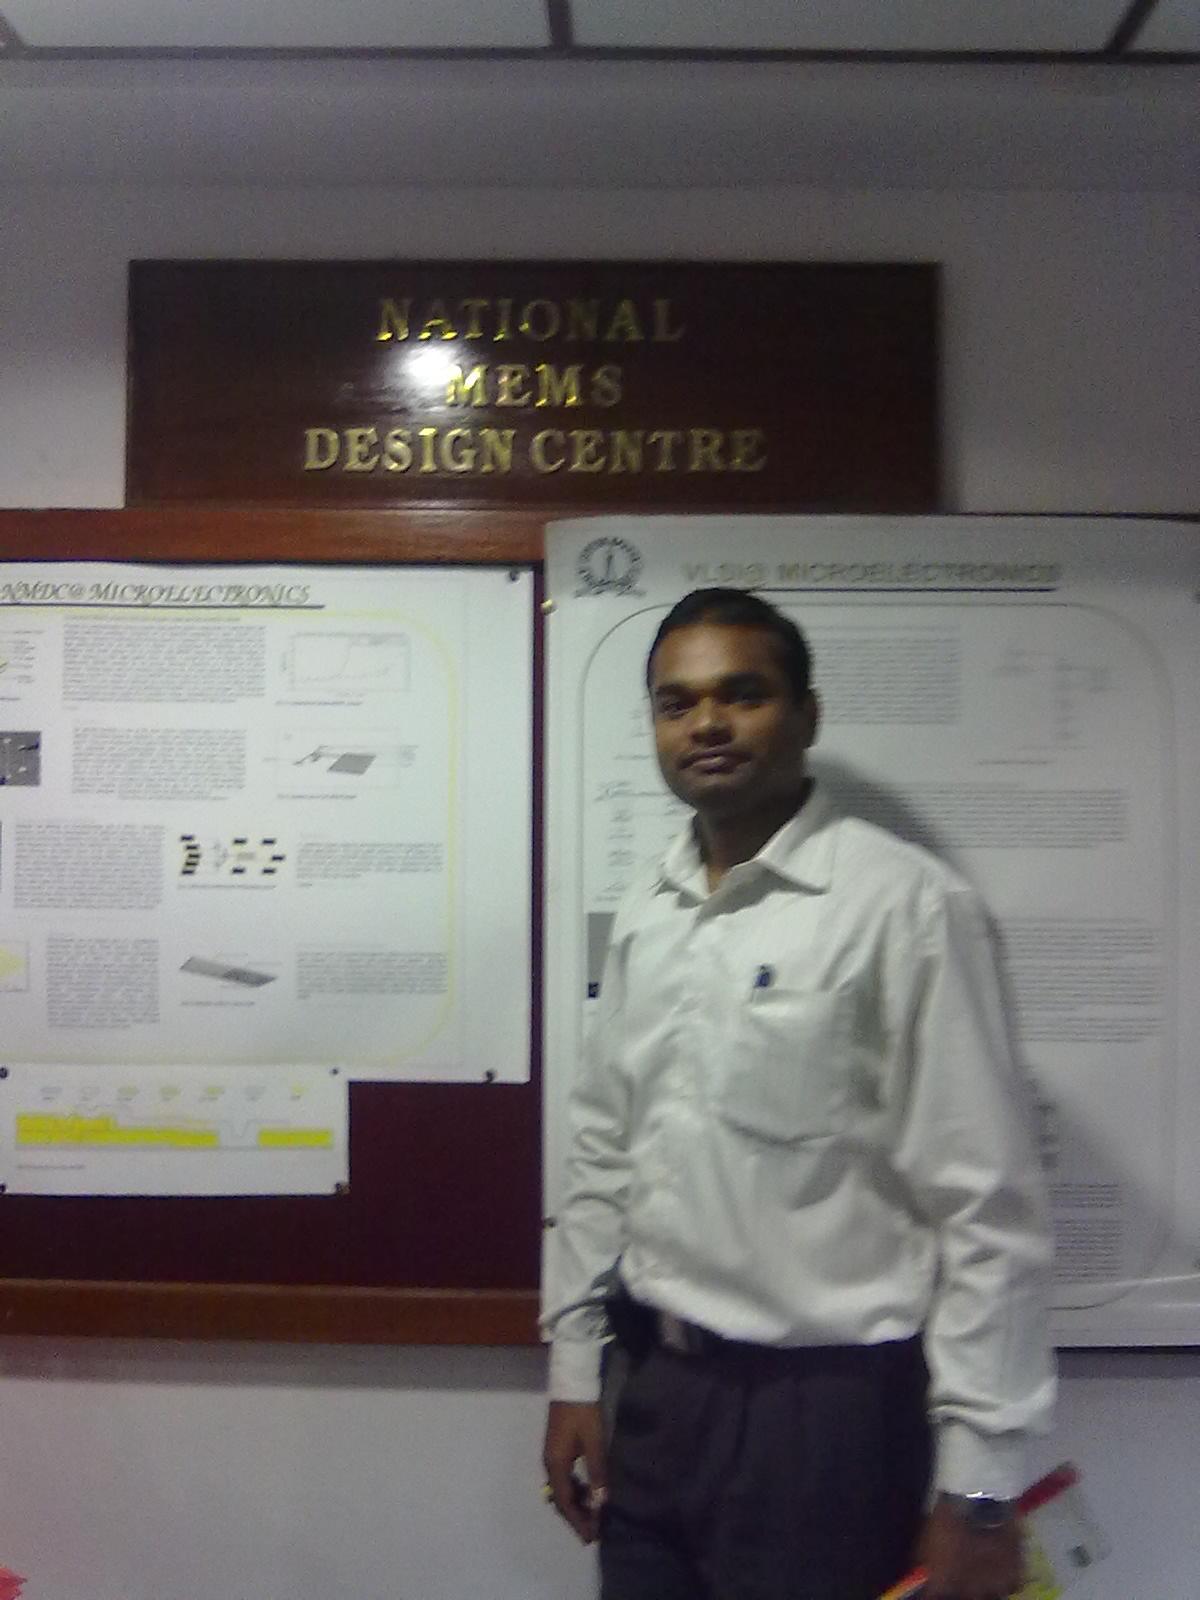 MEMS Lab